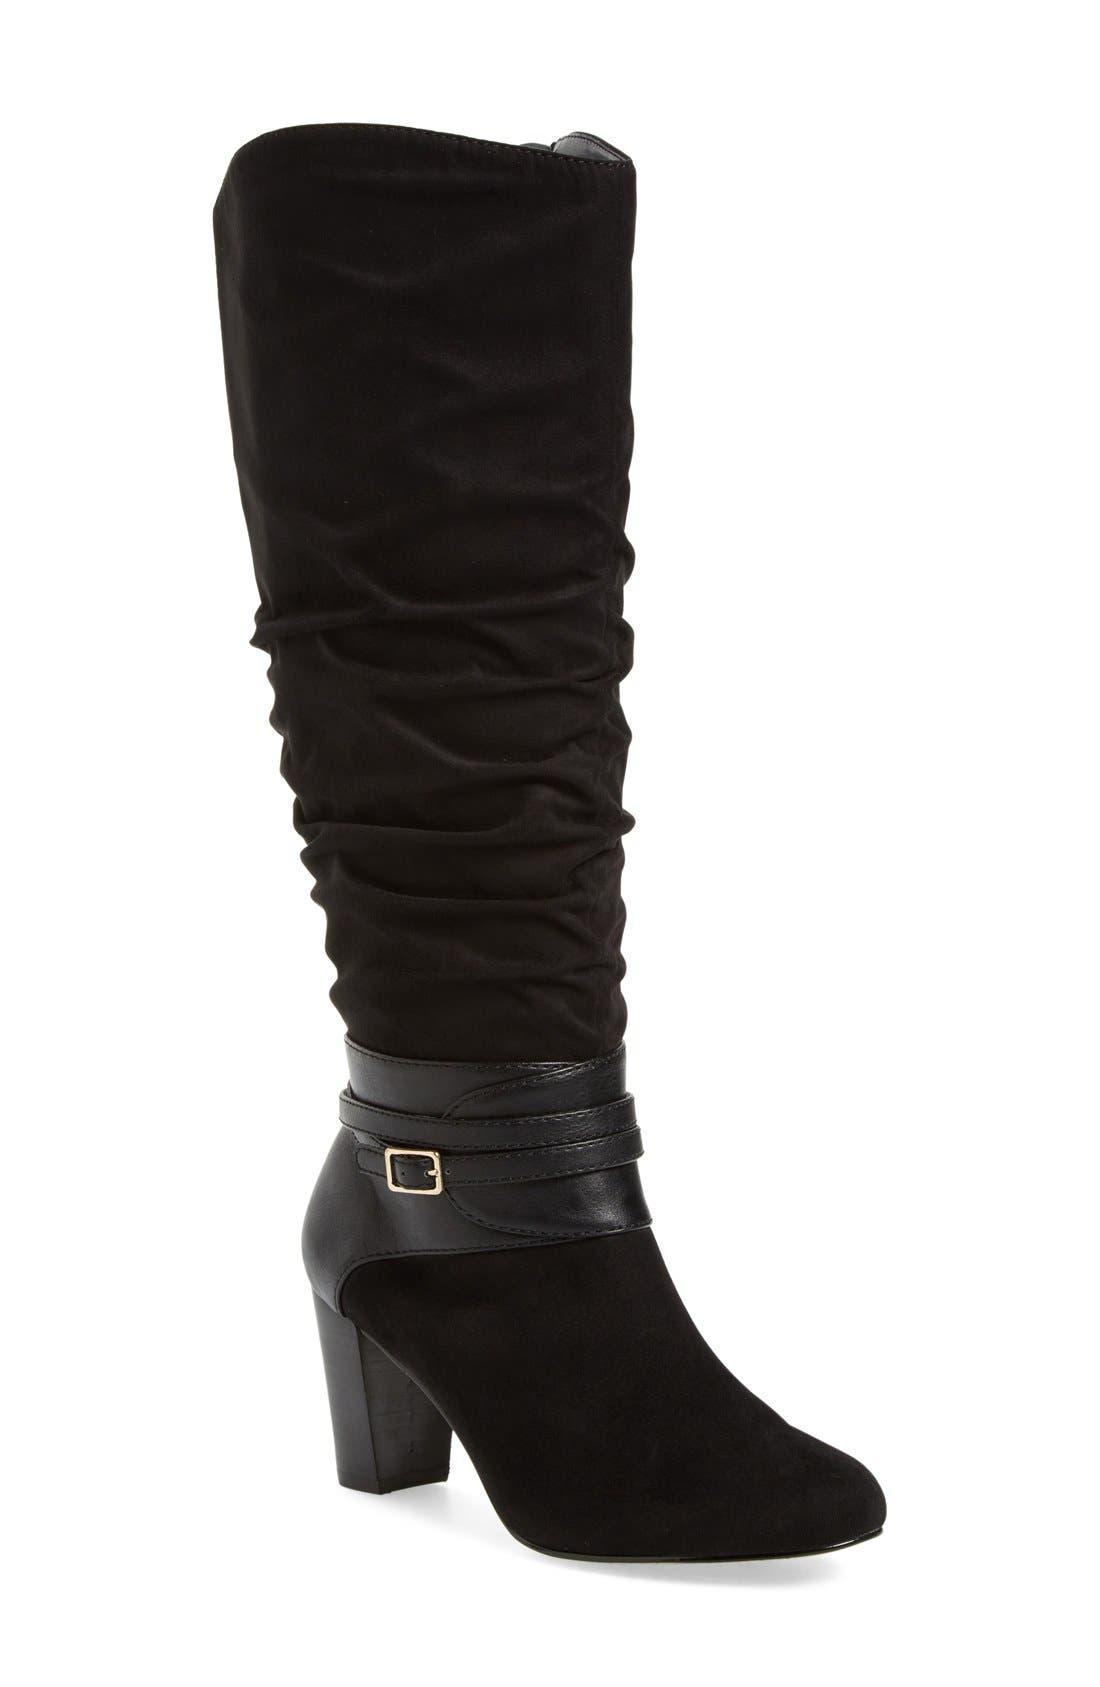 Alternate Image 1 Selected - Bella Vita 'Tabitha II' Tall Boot (Women) (Wide Calf)